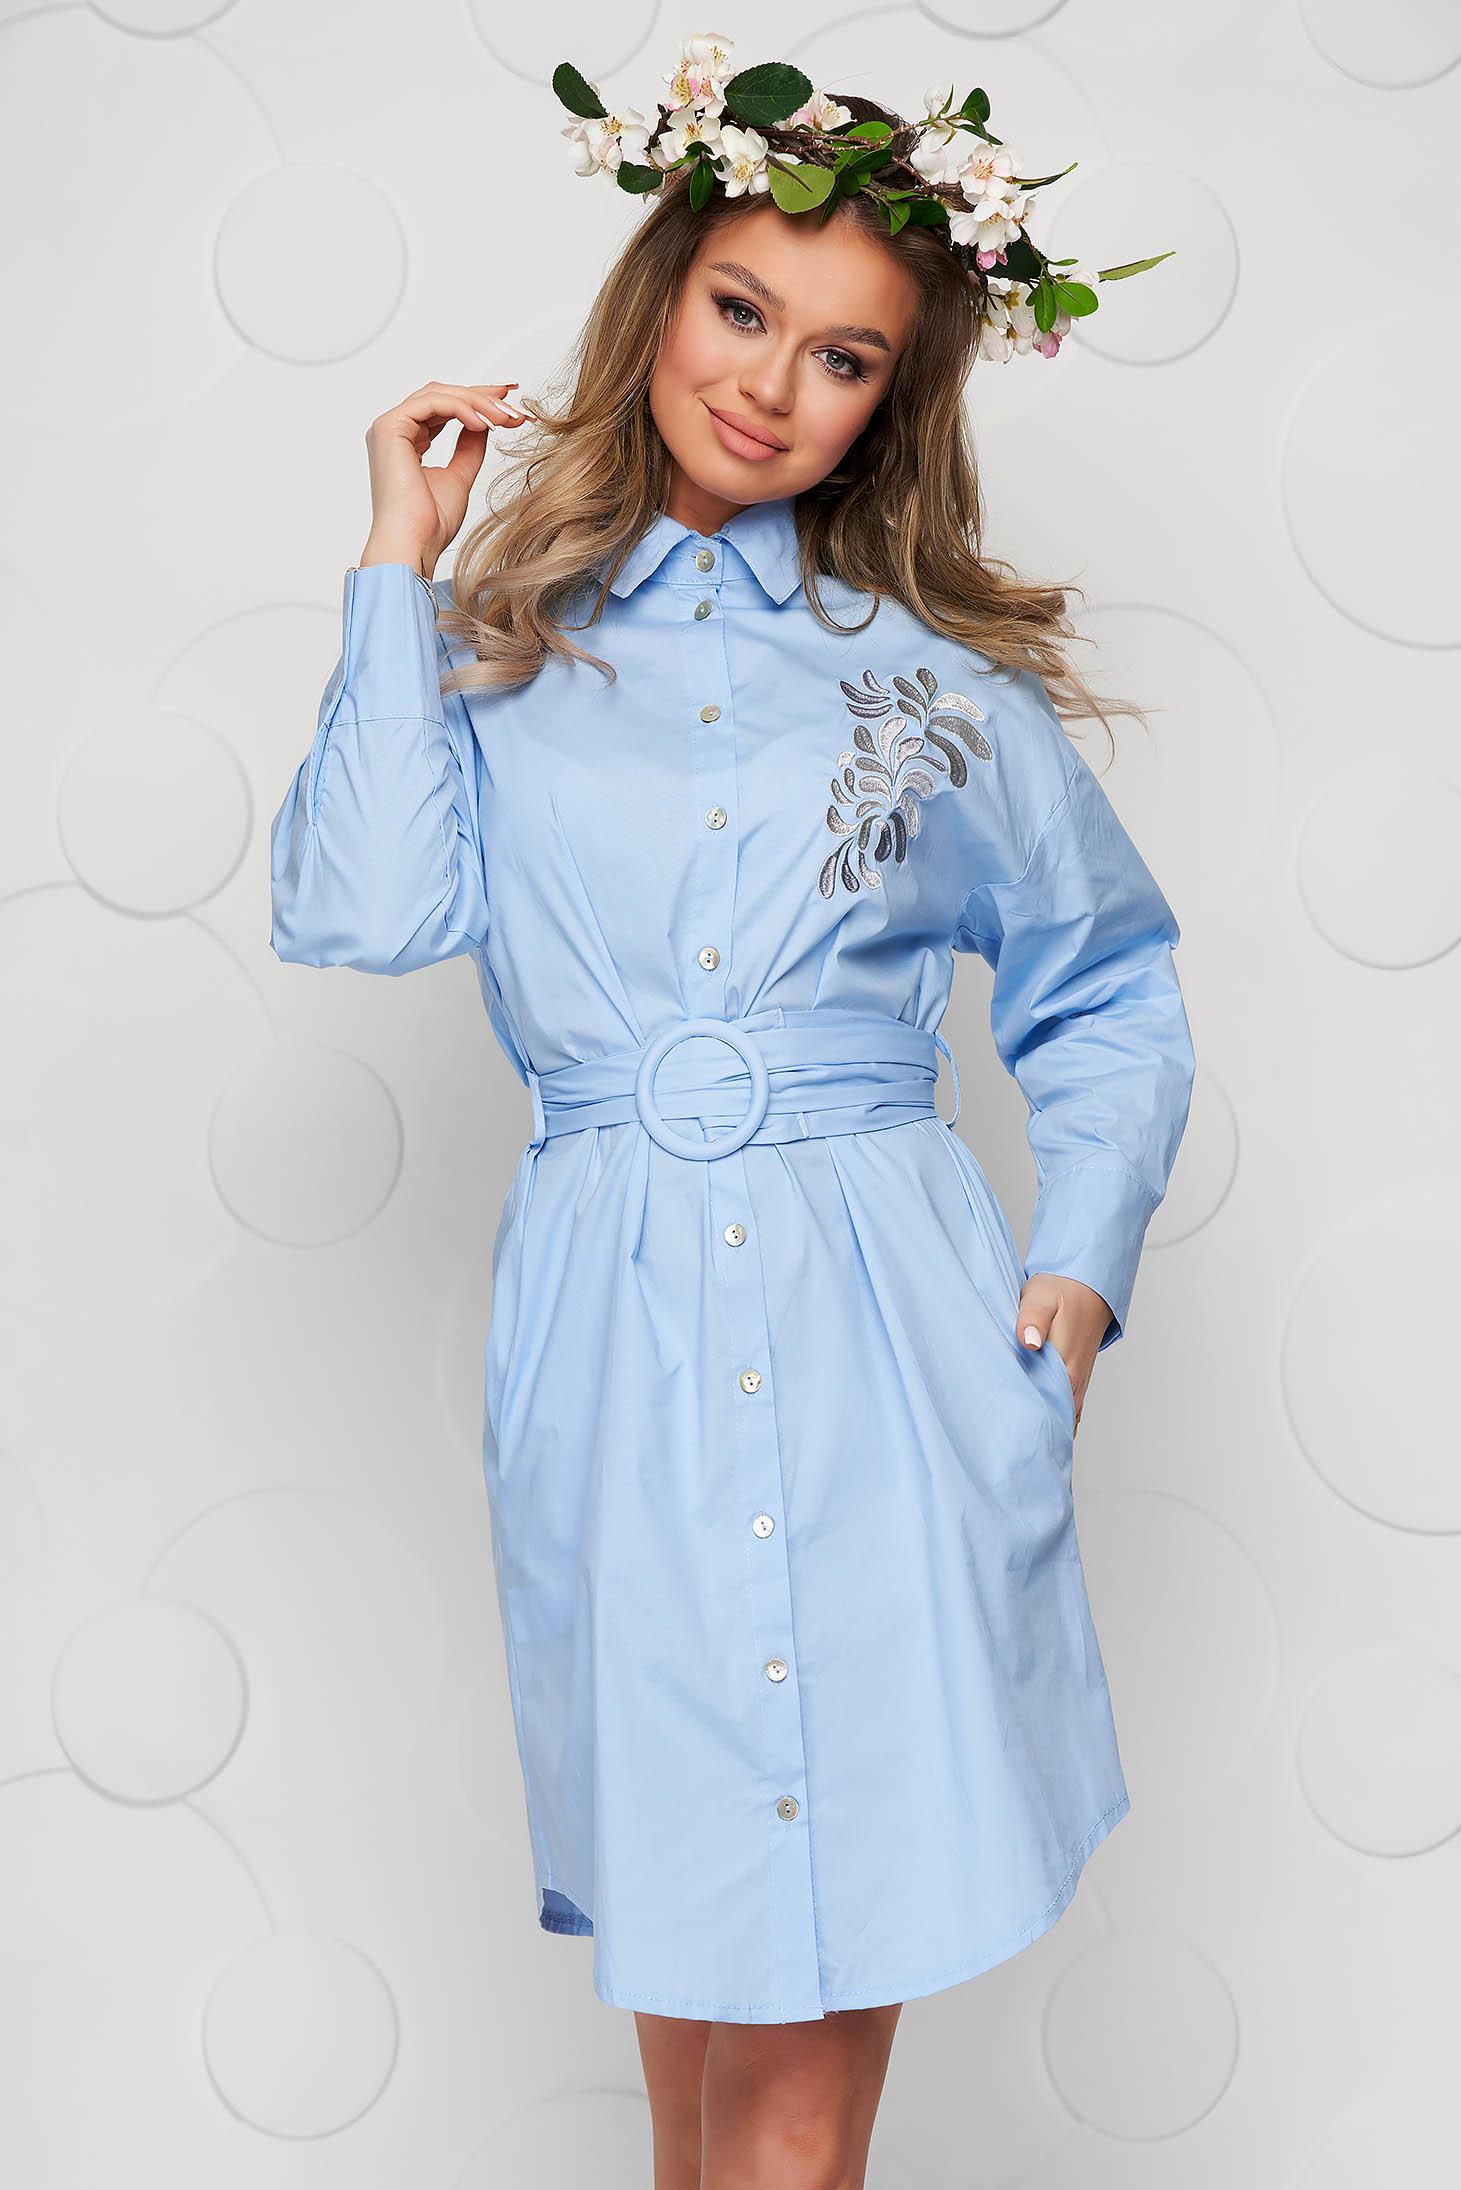 Rochie SunShine albastru-deschis brodata din bumbac subtire cu accesoriu tip curea